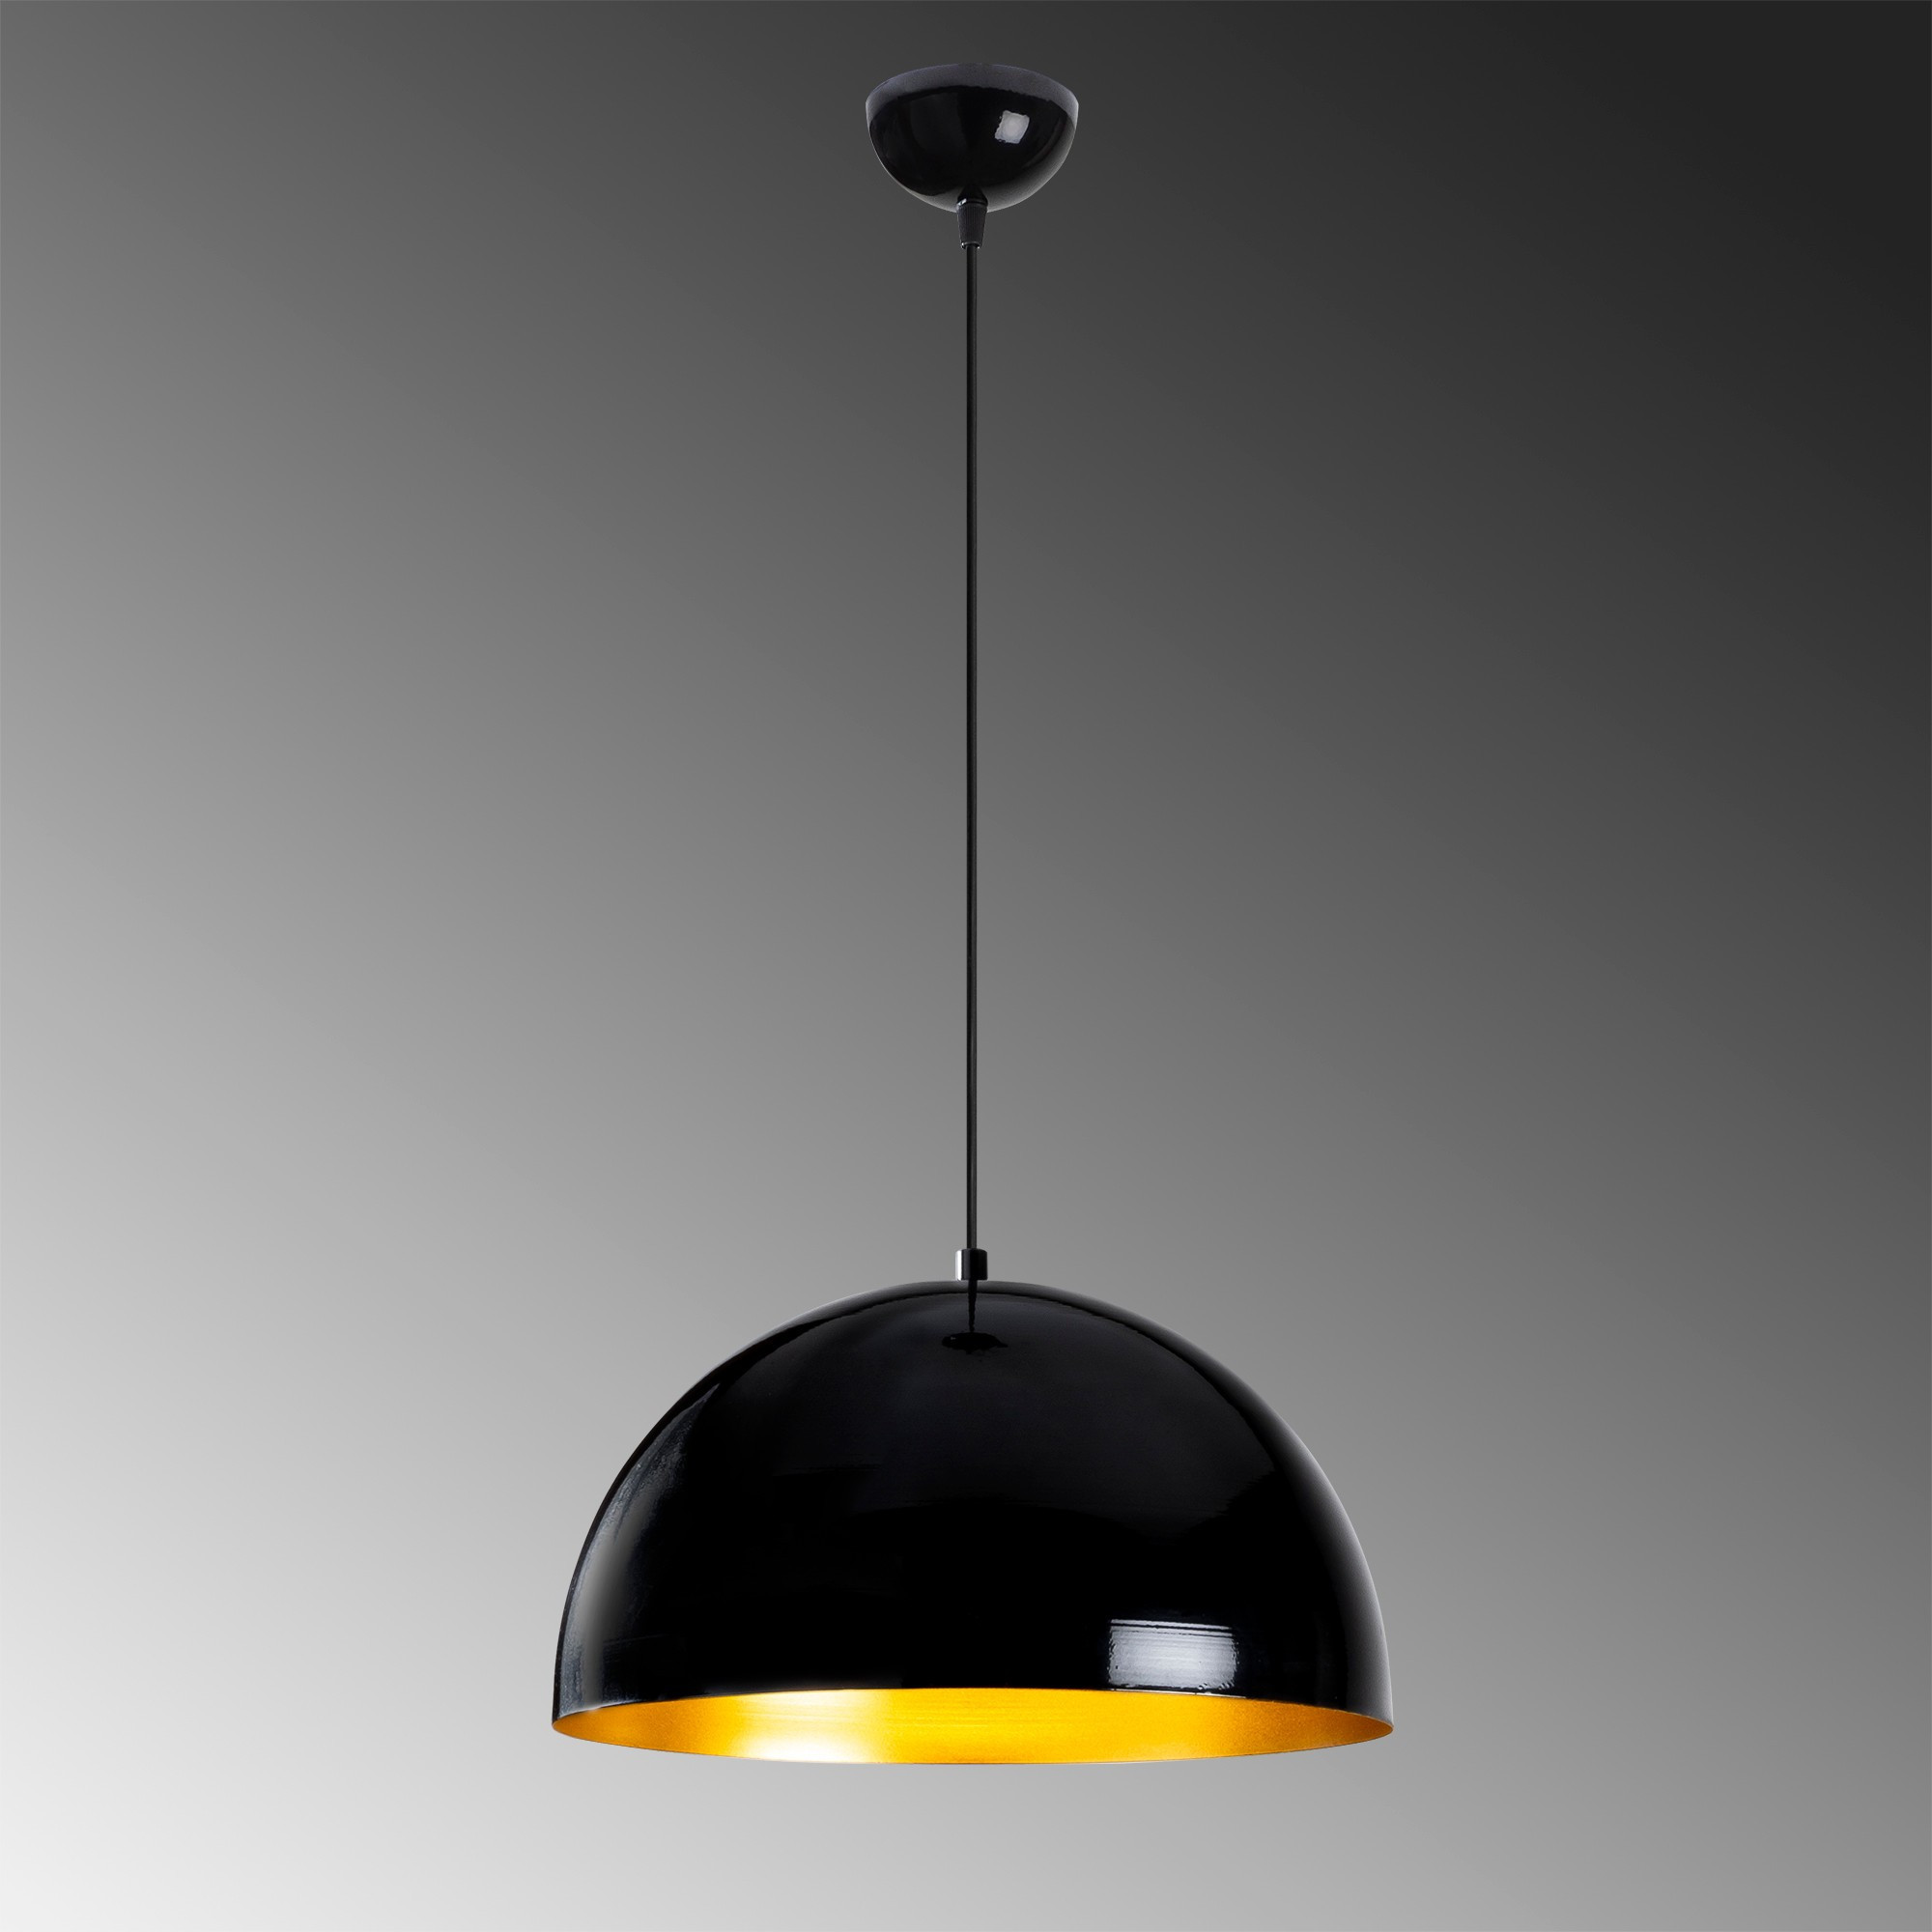 Pendant Lamp Berceste 233-S   Black